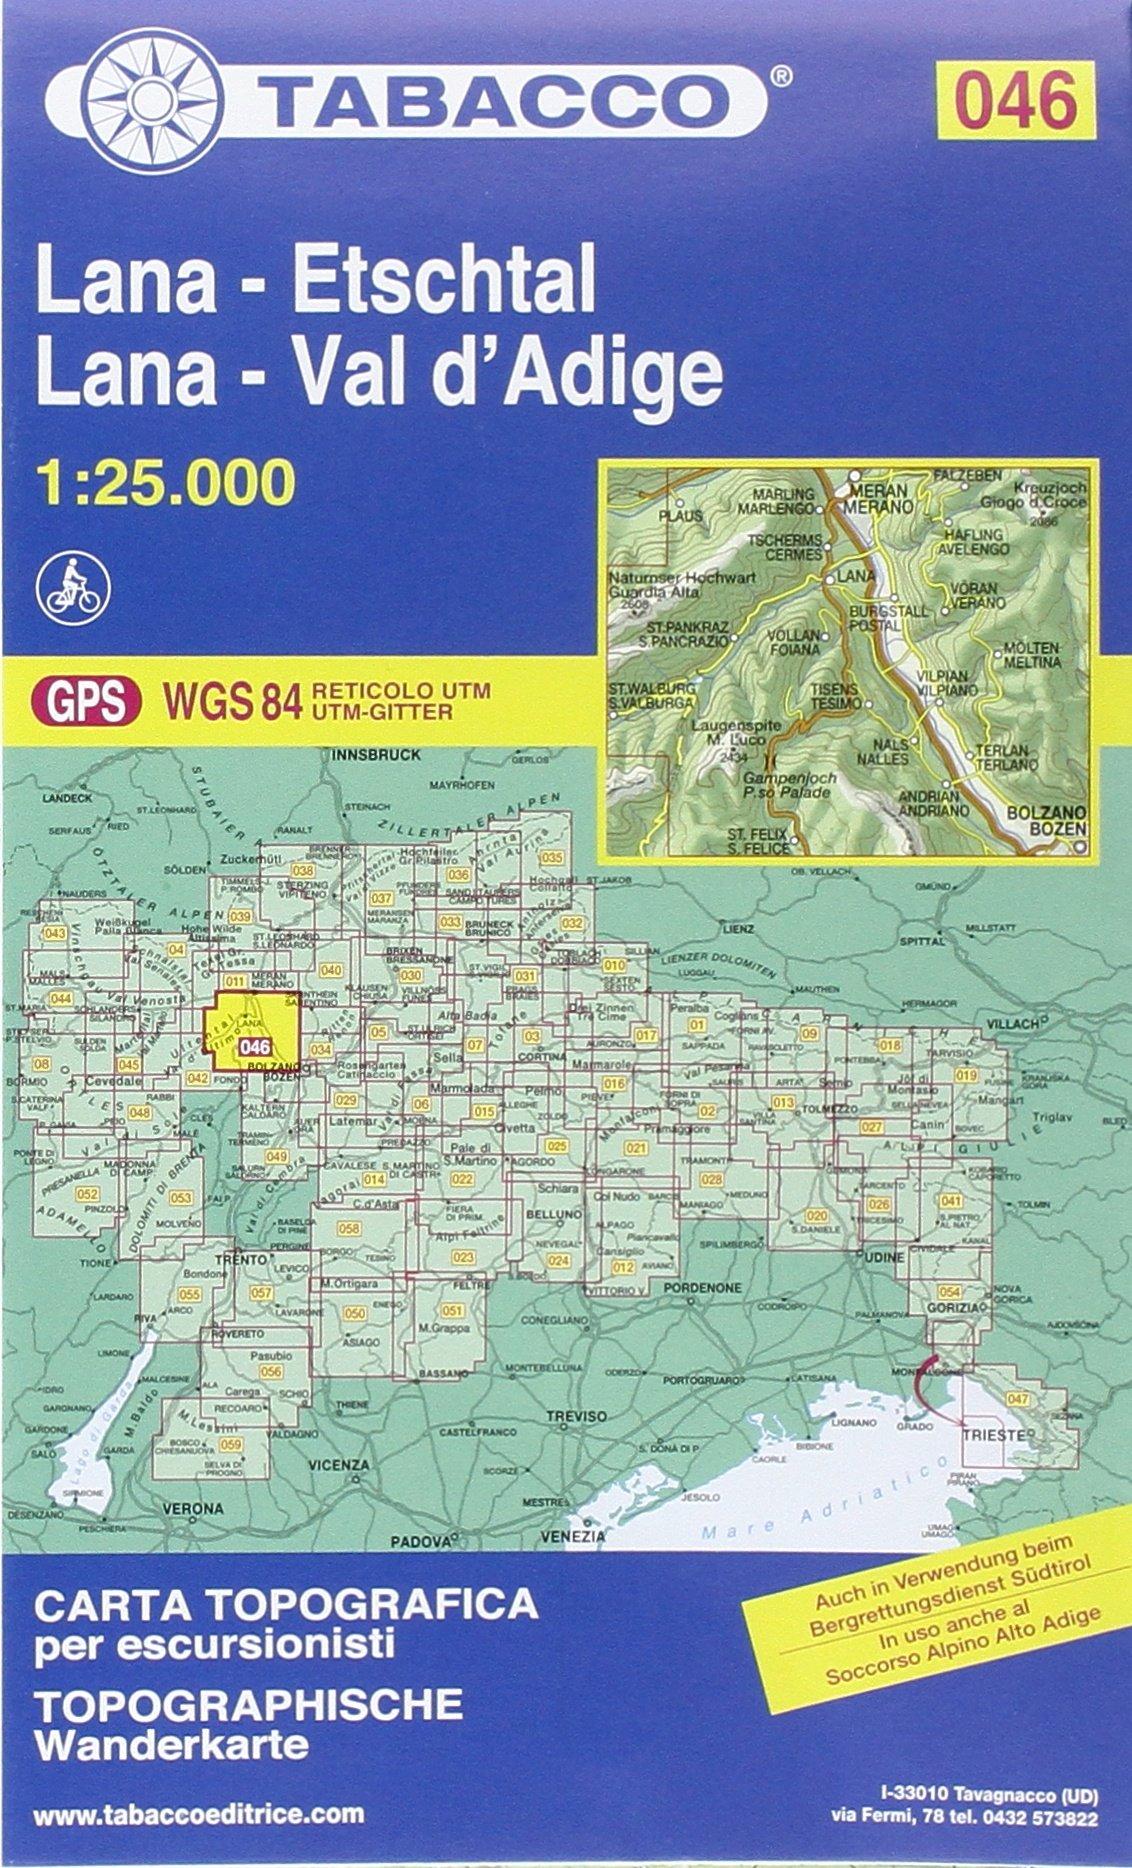 Lana, Etschtal: Wanderkarte Tabacco 046. 1:25000 (Cartes Topograh)